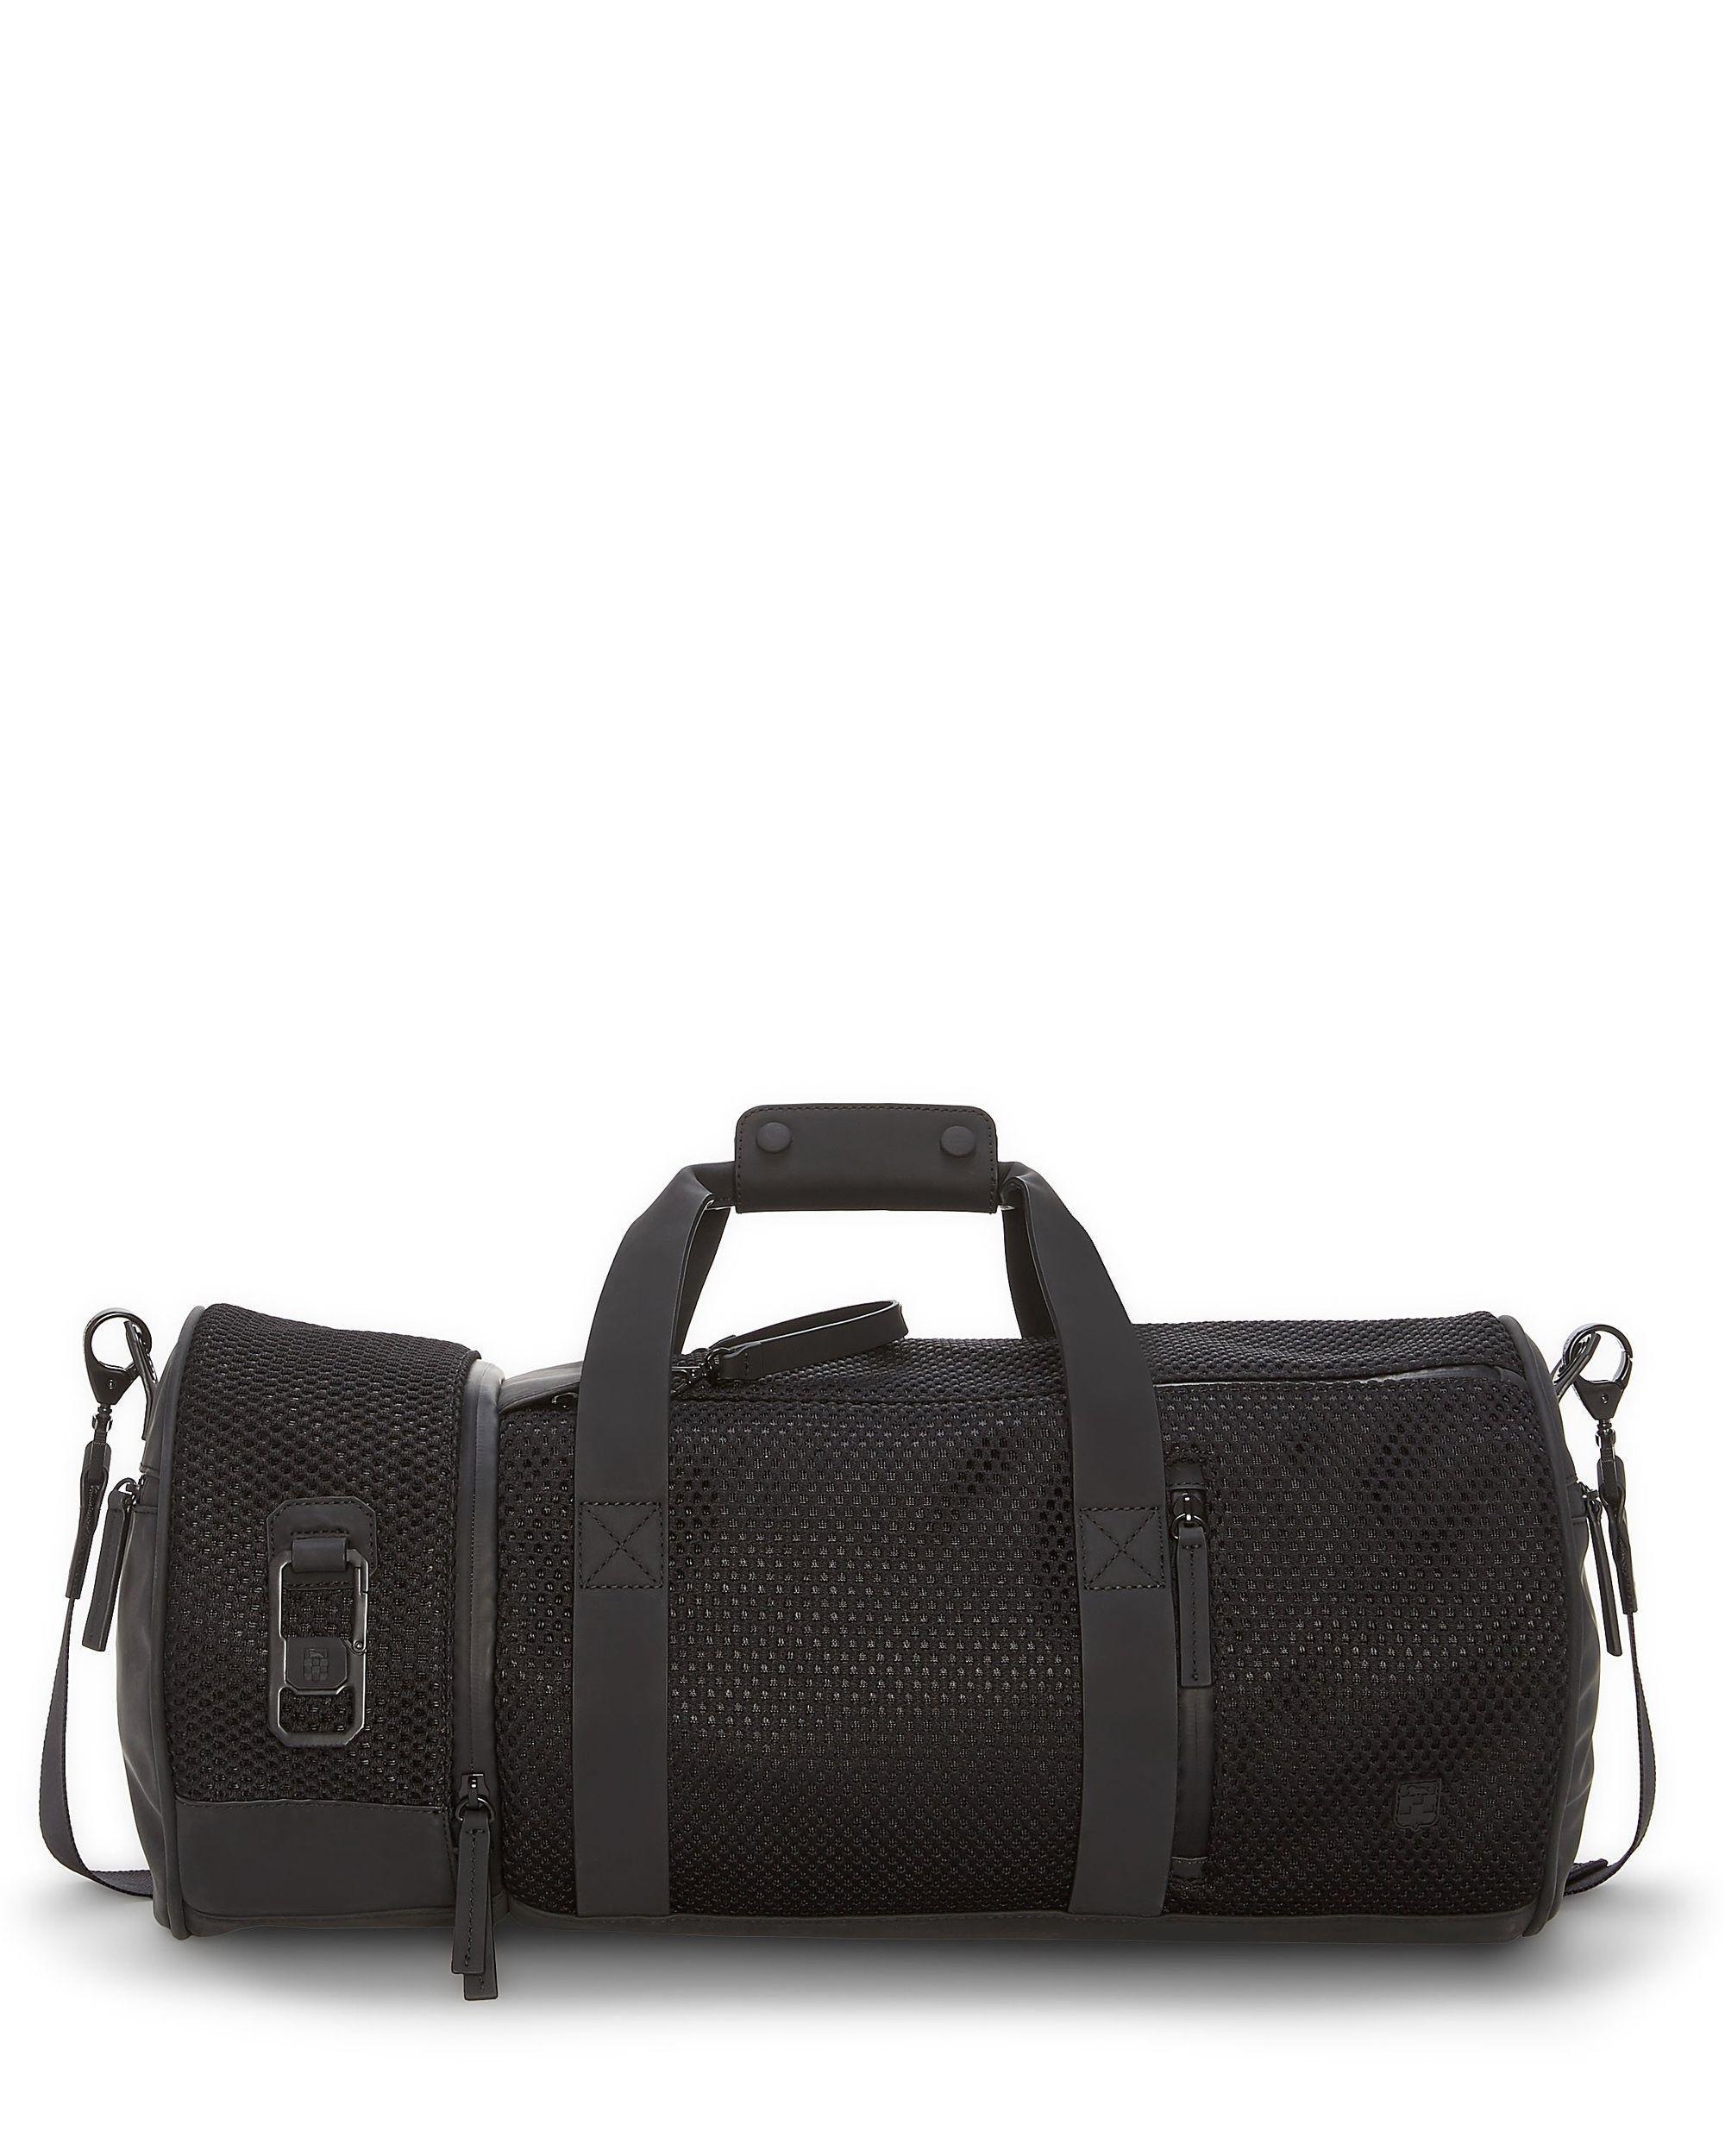 412a6e76e120 Lyst - Vince Camuto Urban – Mesh Duffel in Black for Men - Save 50%